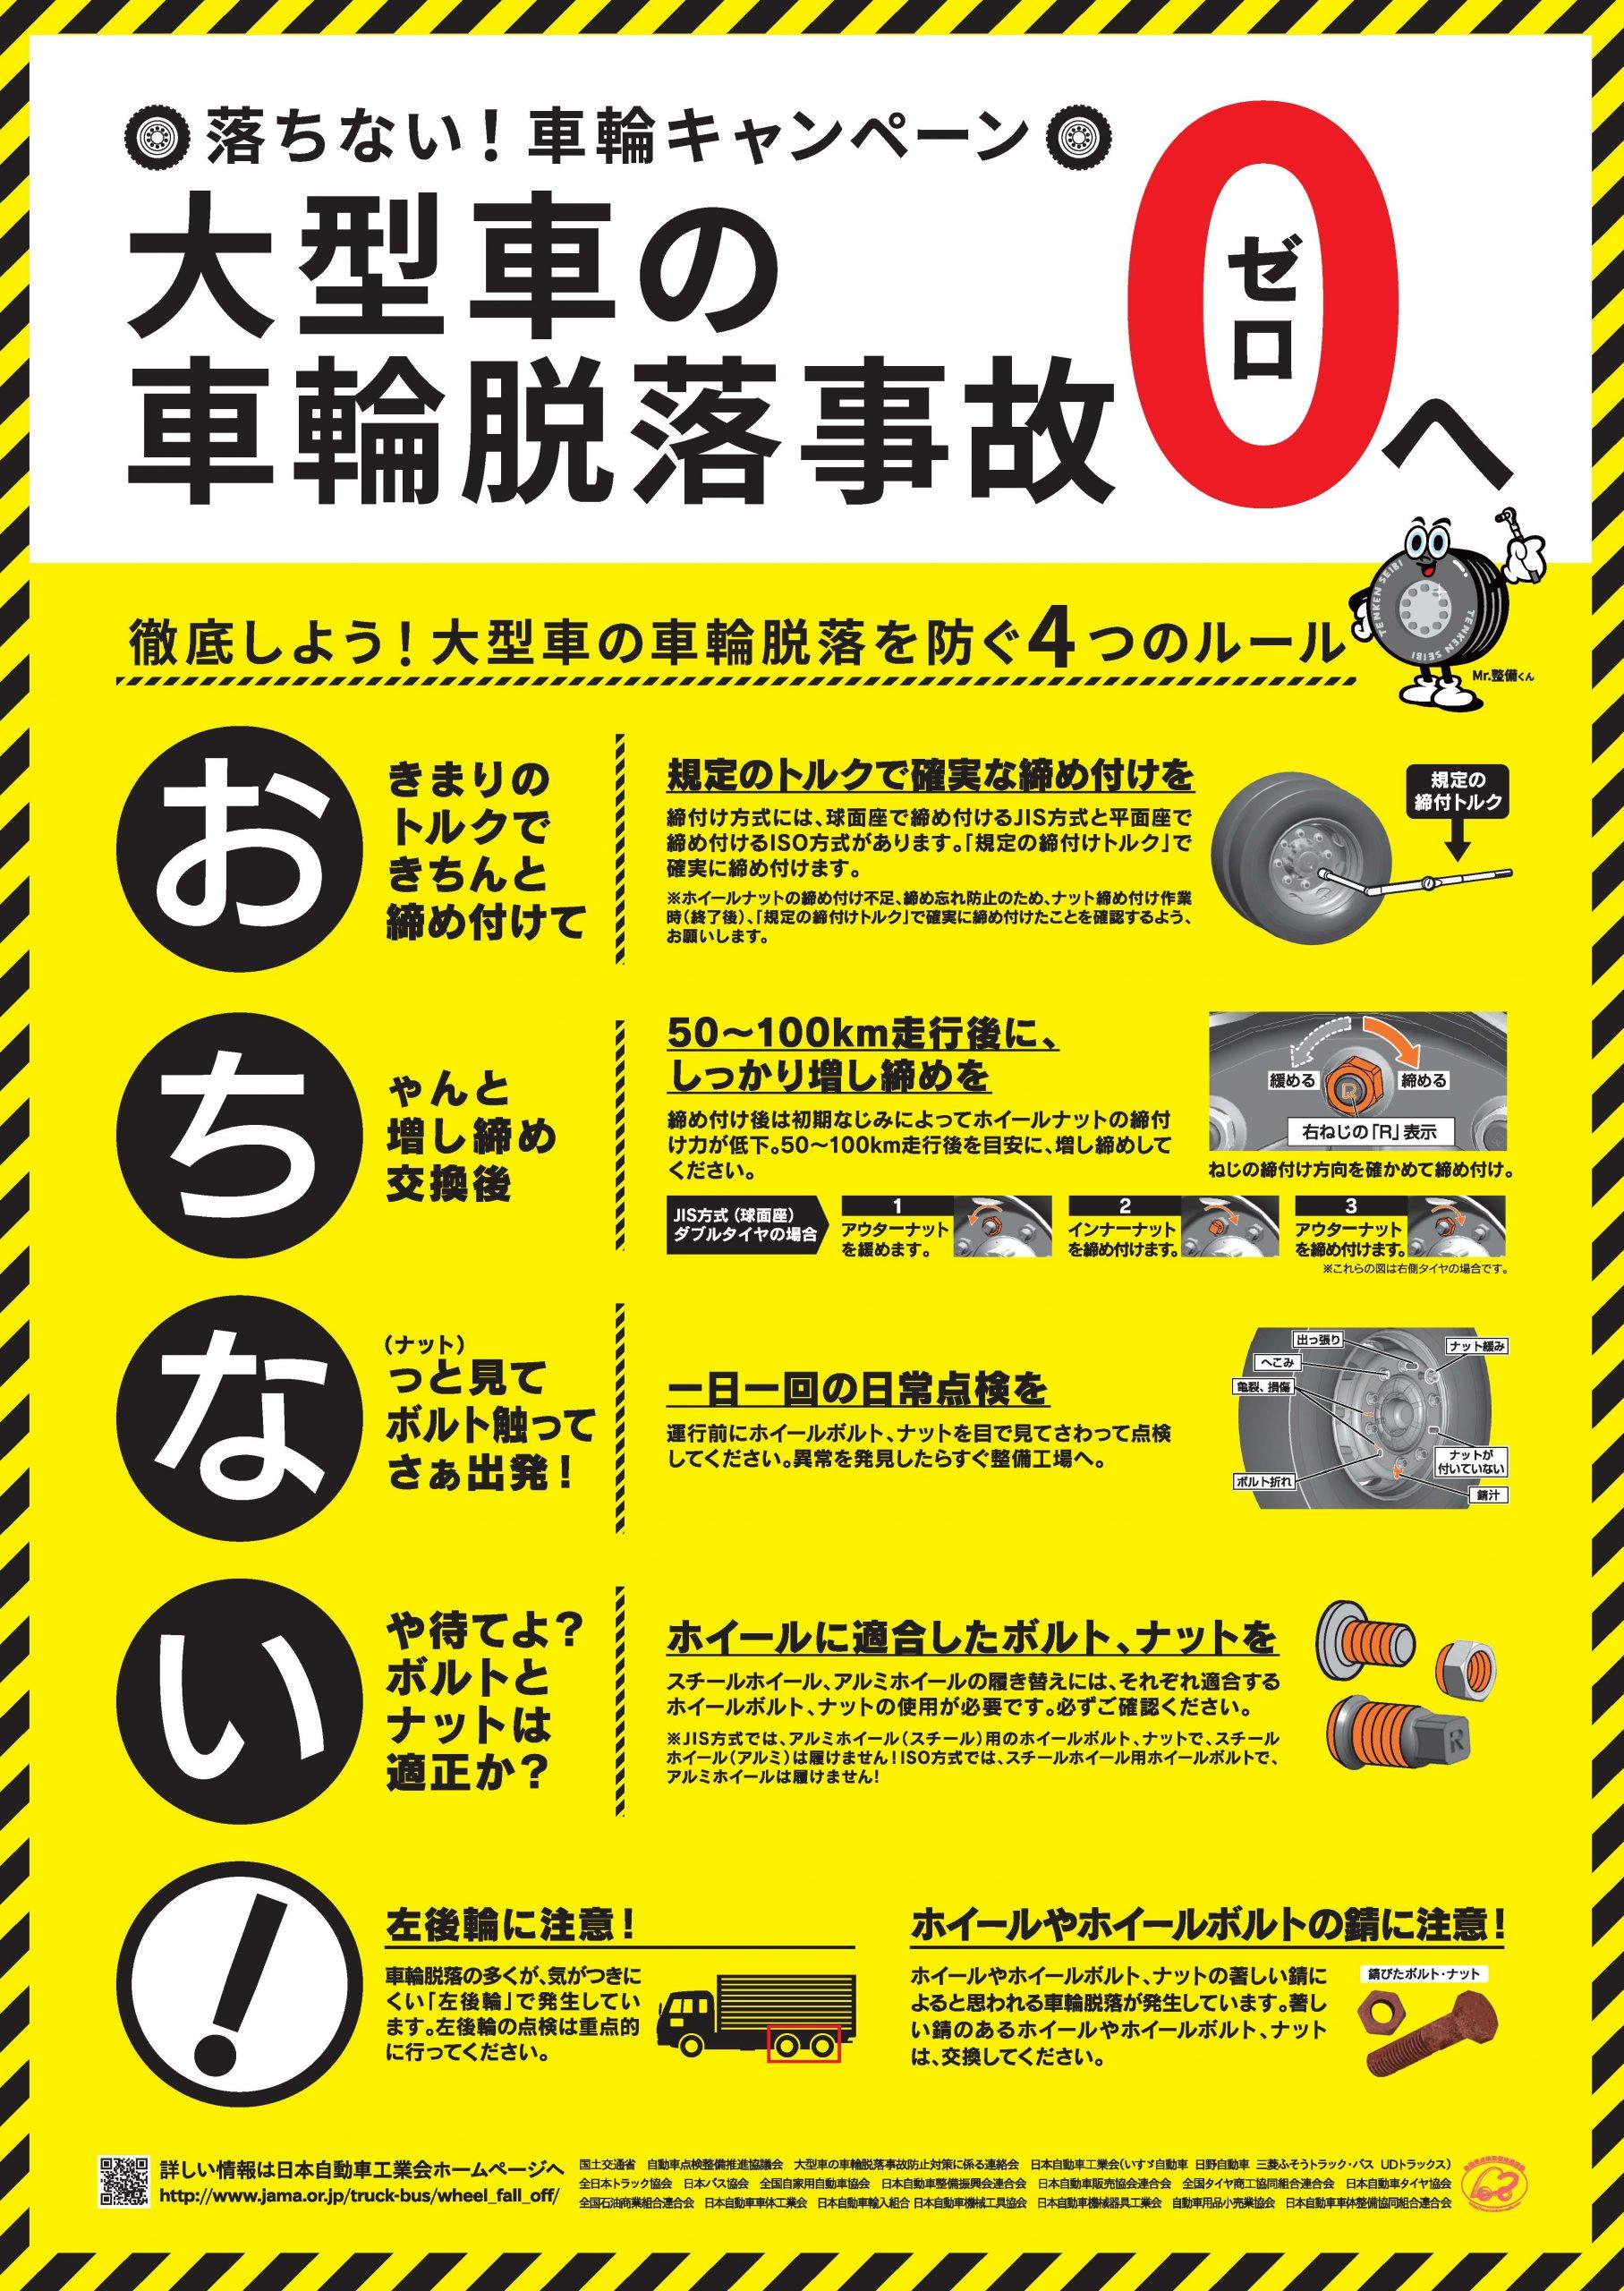 大型車車輪脱落事故防止対策リーフレット